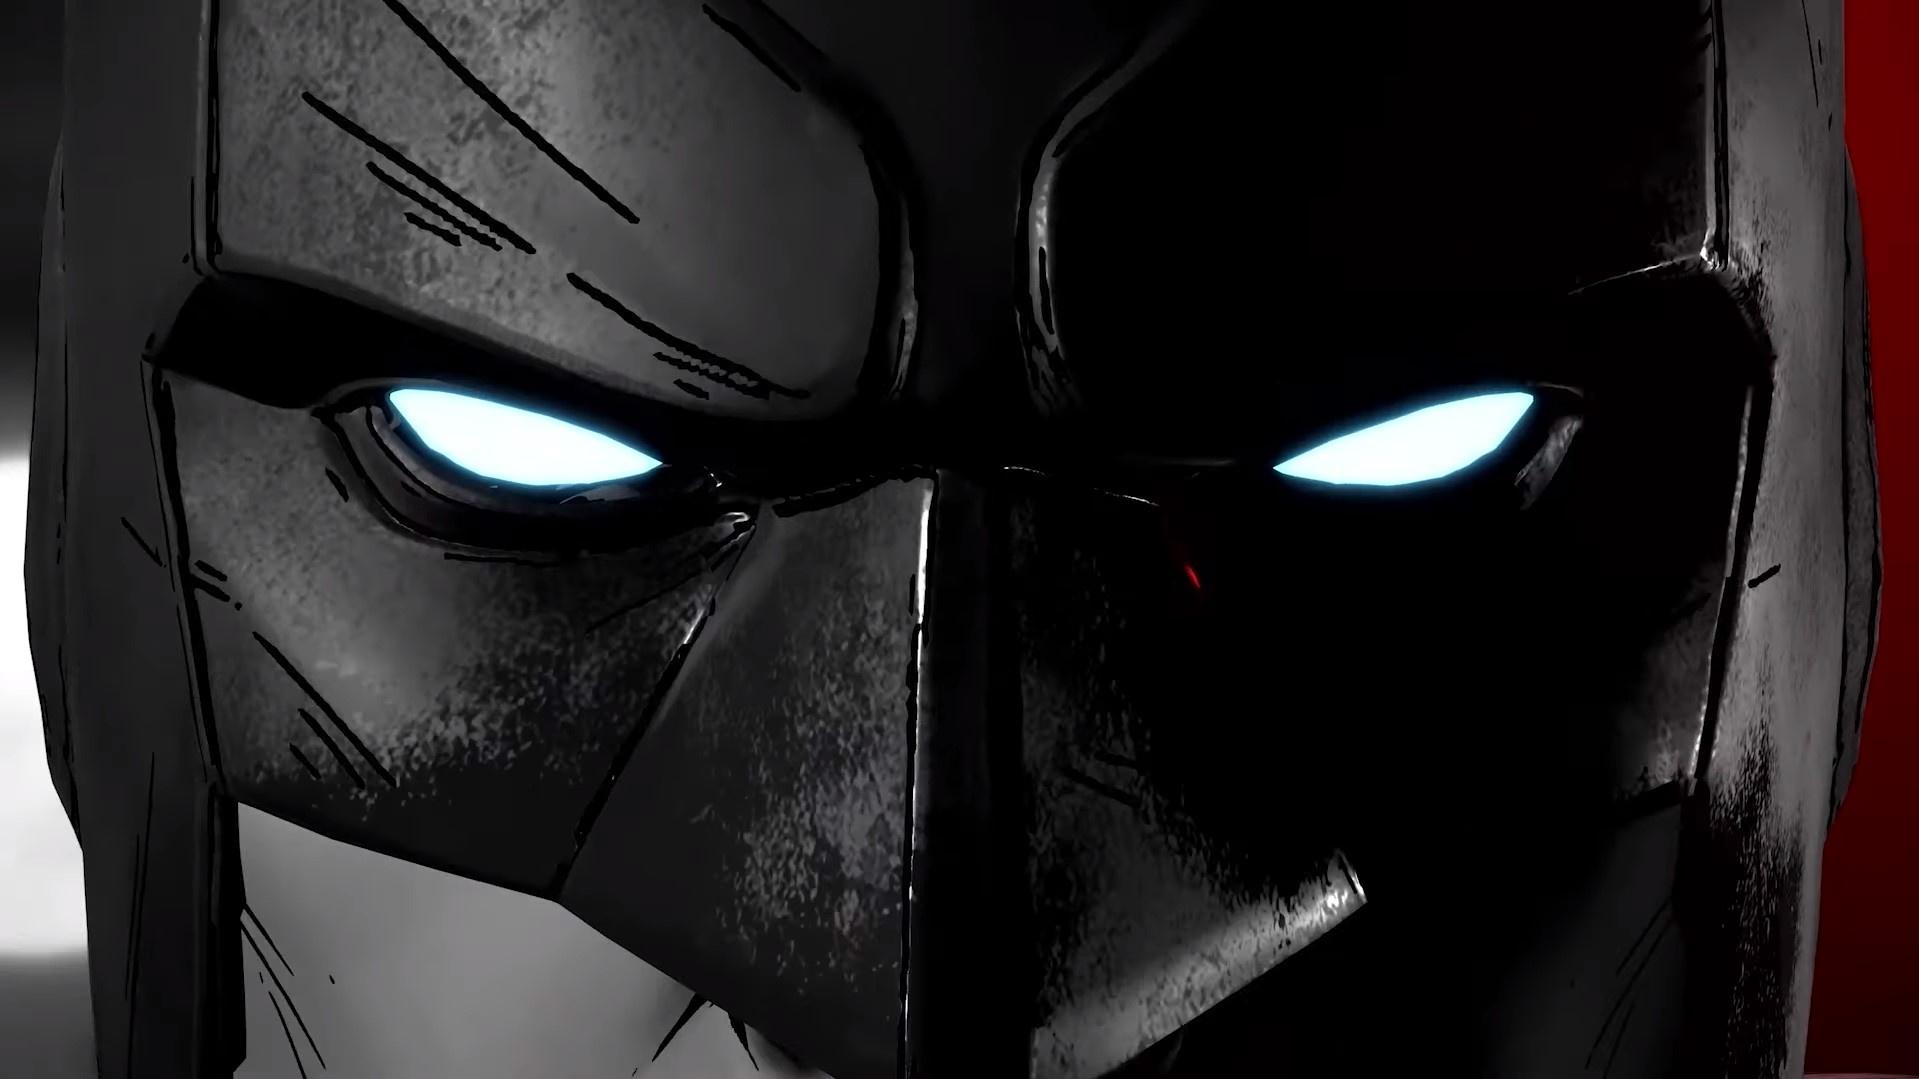 Состоялся релиз нуар-издания «Бэтмена» от Telltale